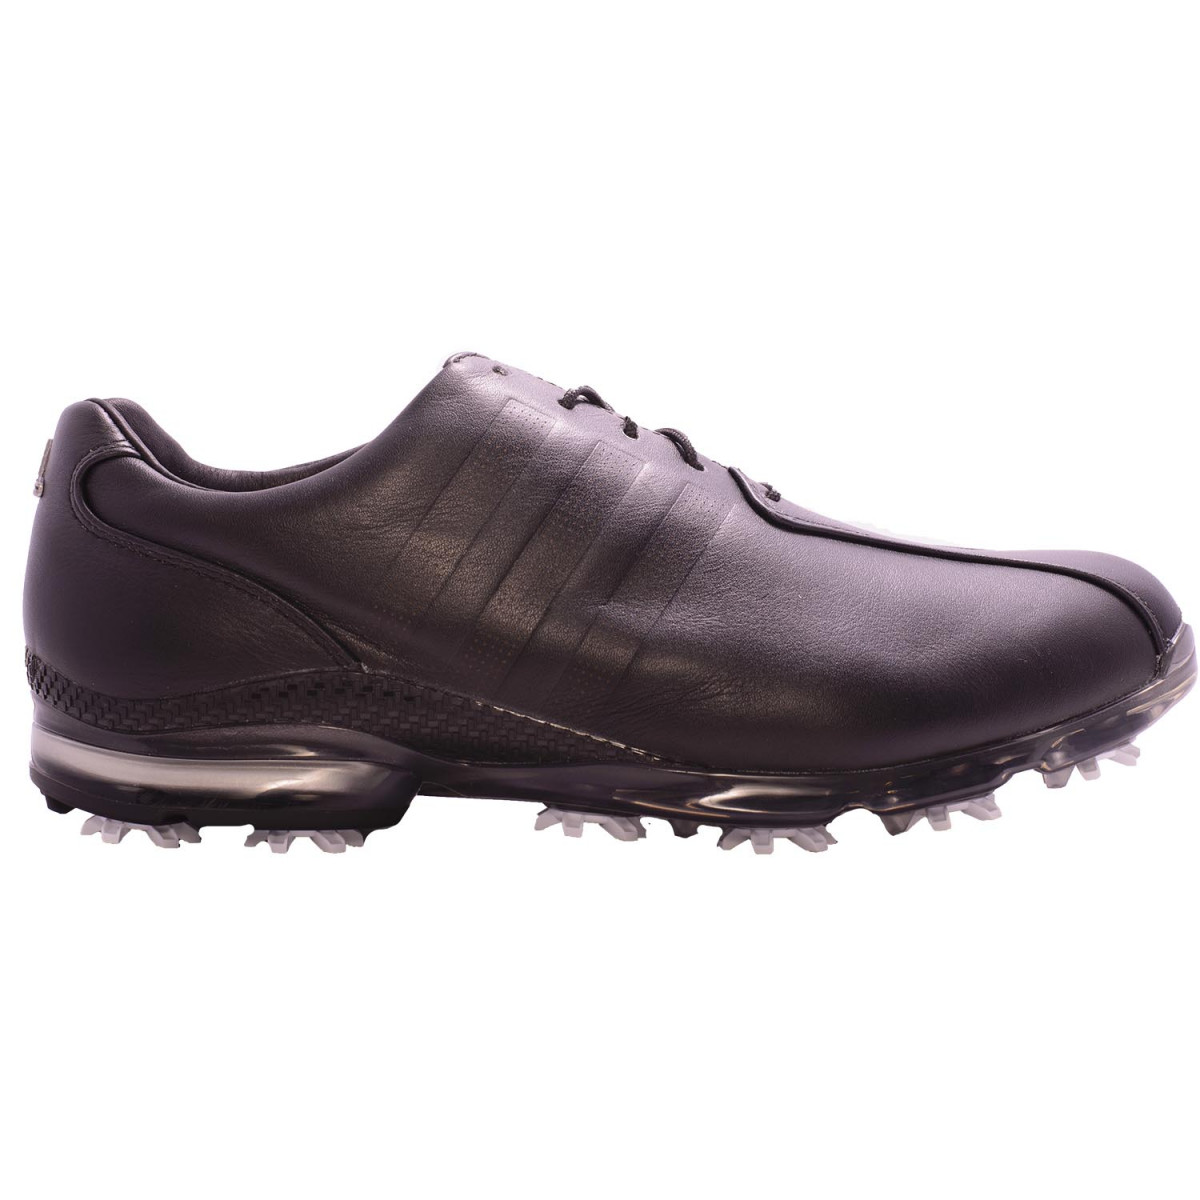 online store ec8d5 32bbf Zapatillas Adidas Adipure Tp